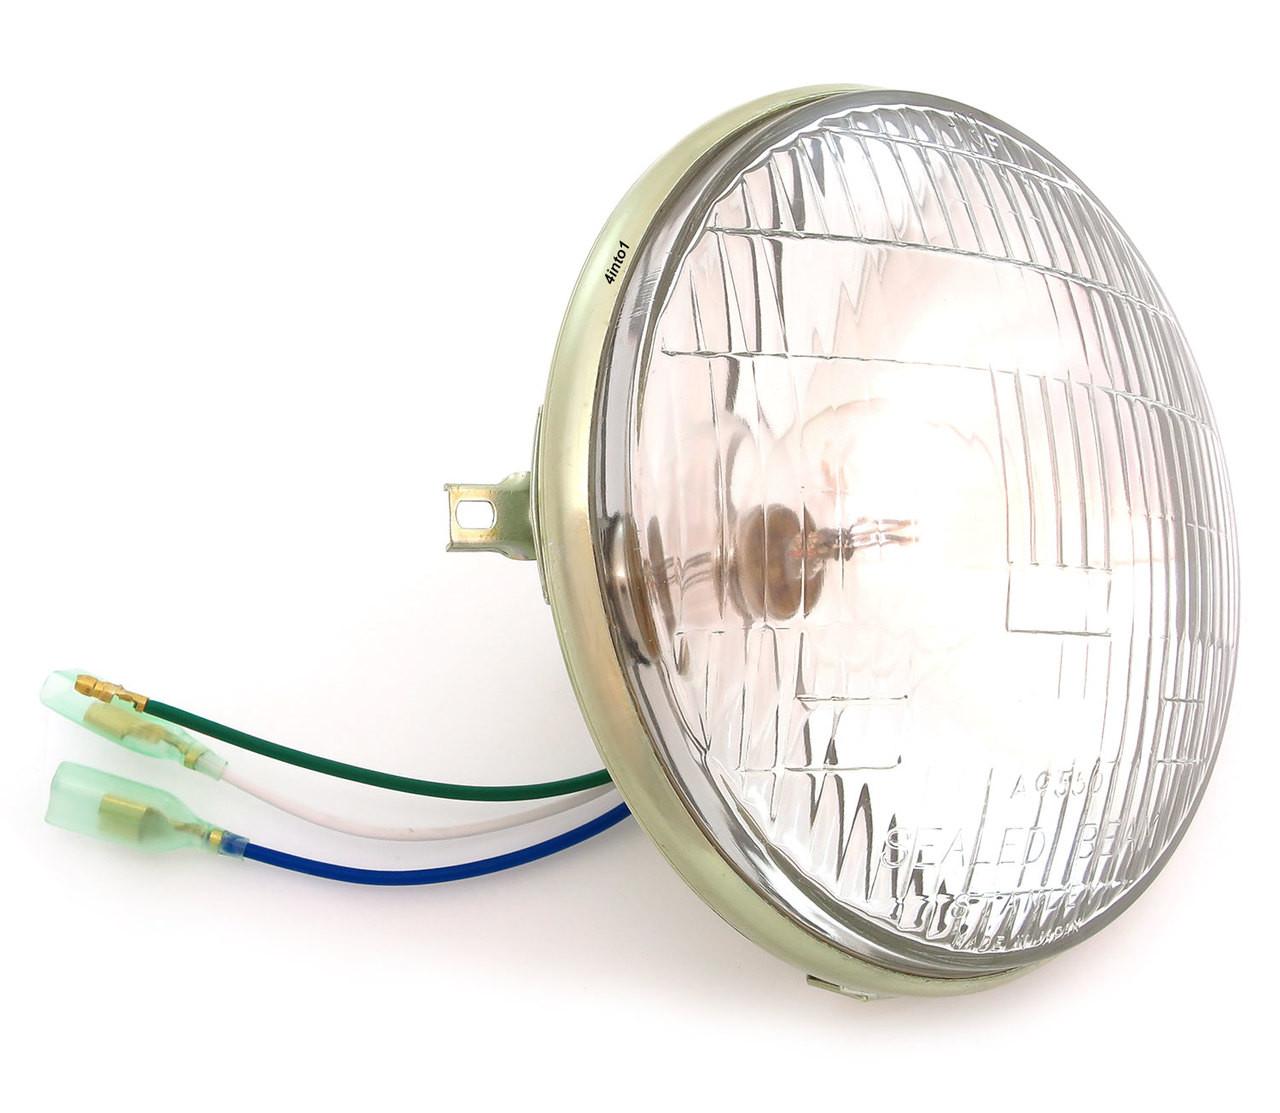 Honda Cb175 Headlight Wiring Diy Enthusiasts Diagrams Bobber Diagram Free Vehicle Genuine 12v Sealed Beam 33120 292 673 Cb Rh 4into1 Com Cb125